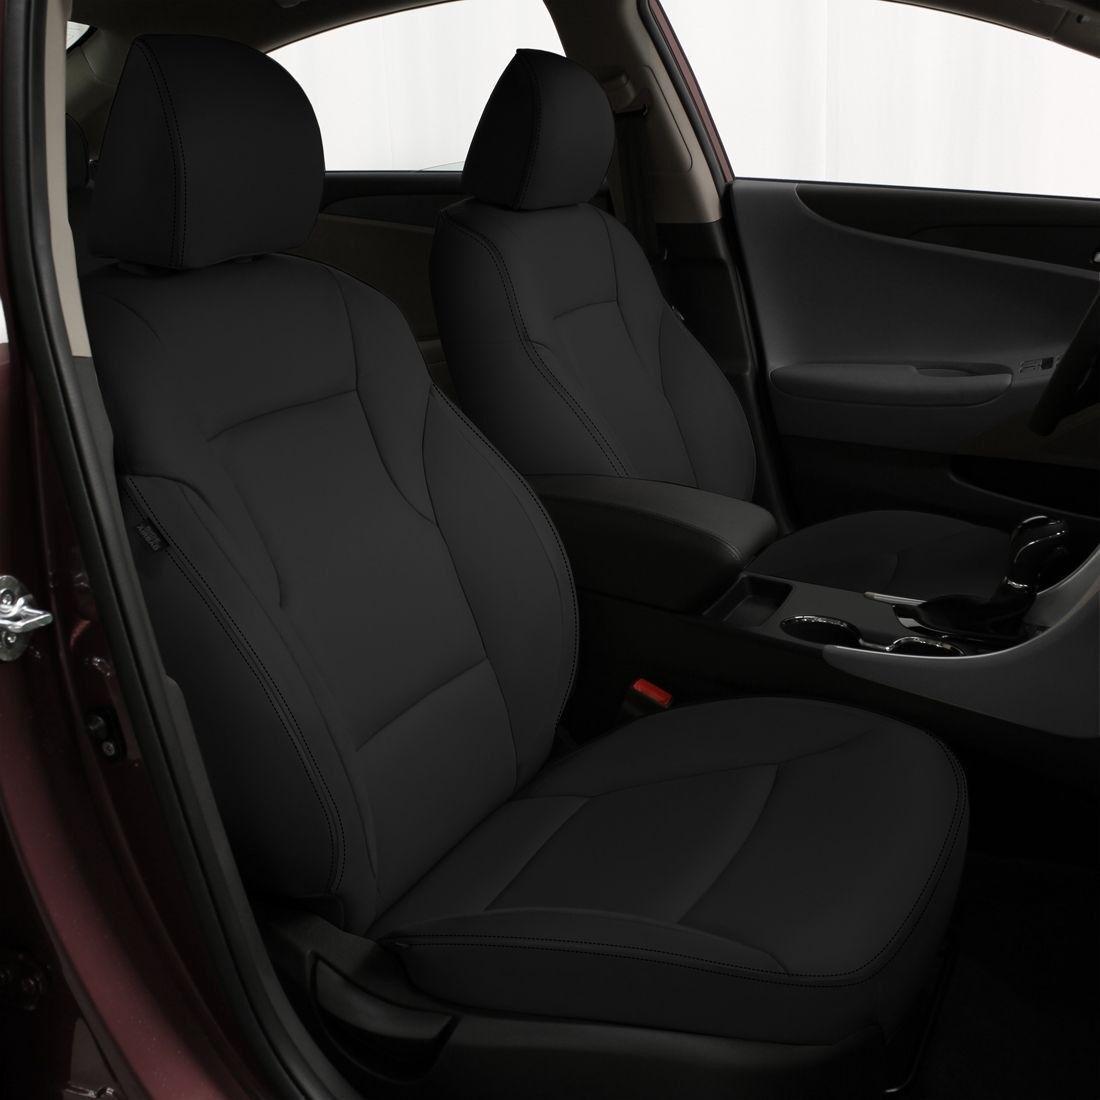 katzkin black leather interior seat cover fits 2013 2014. Black Bedroom Furniture Sets. Home Design Ideas